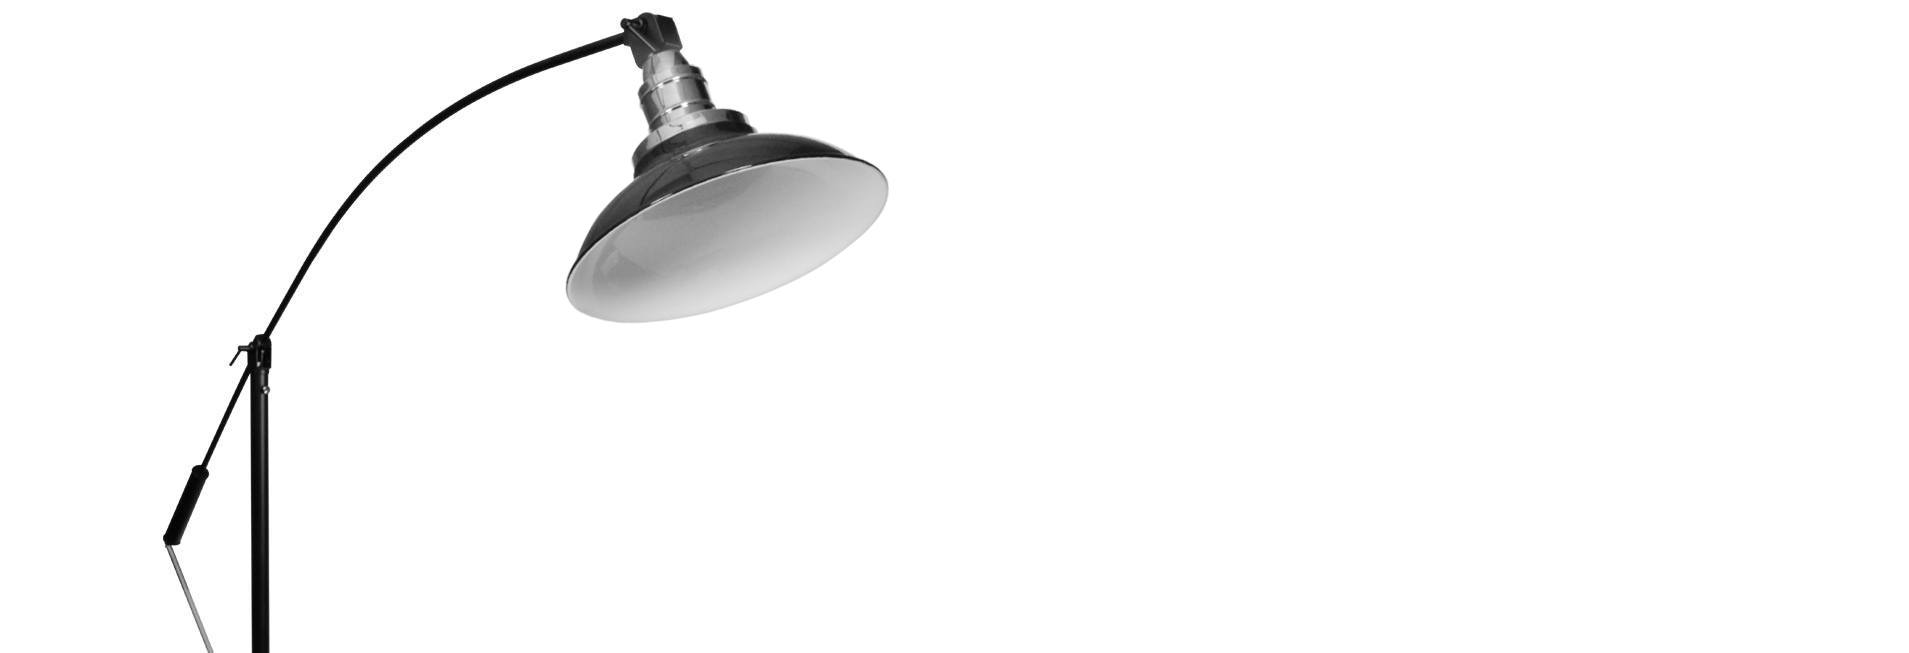 Peony LED Floor Lamp